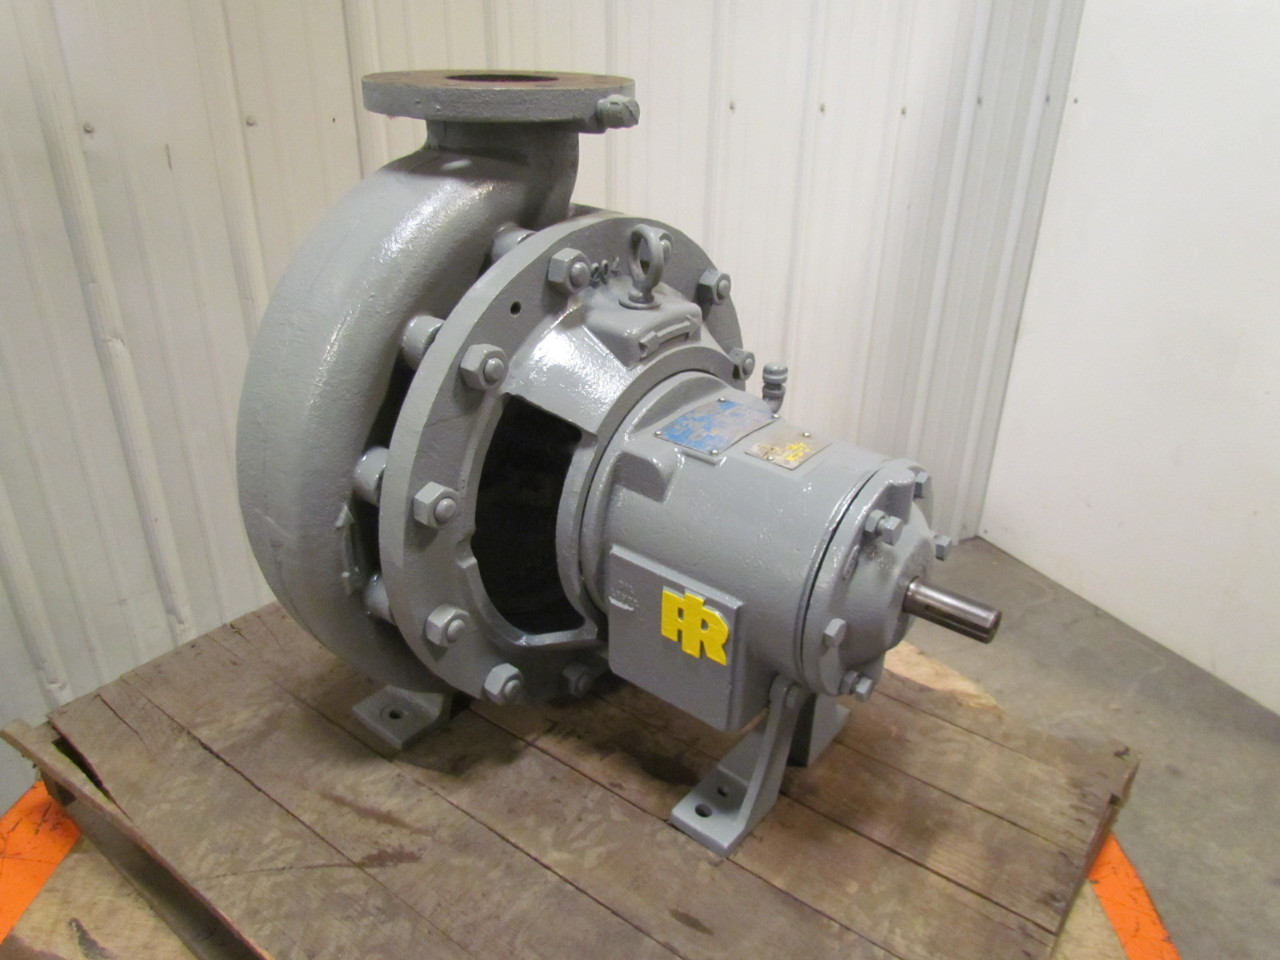 Centrifugal Pumps: Ingersoll Rand Centrifugal Pumps